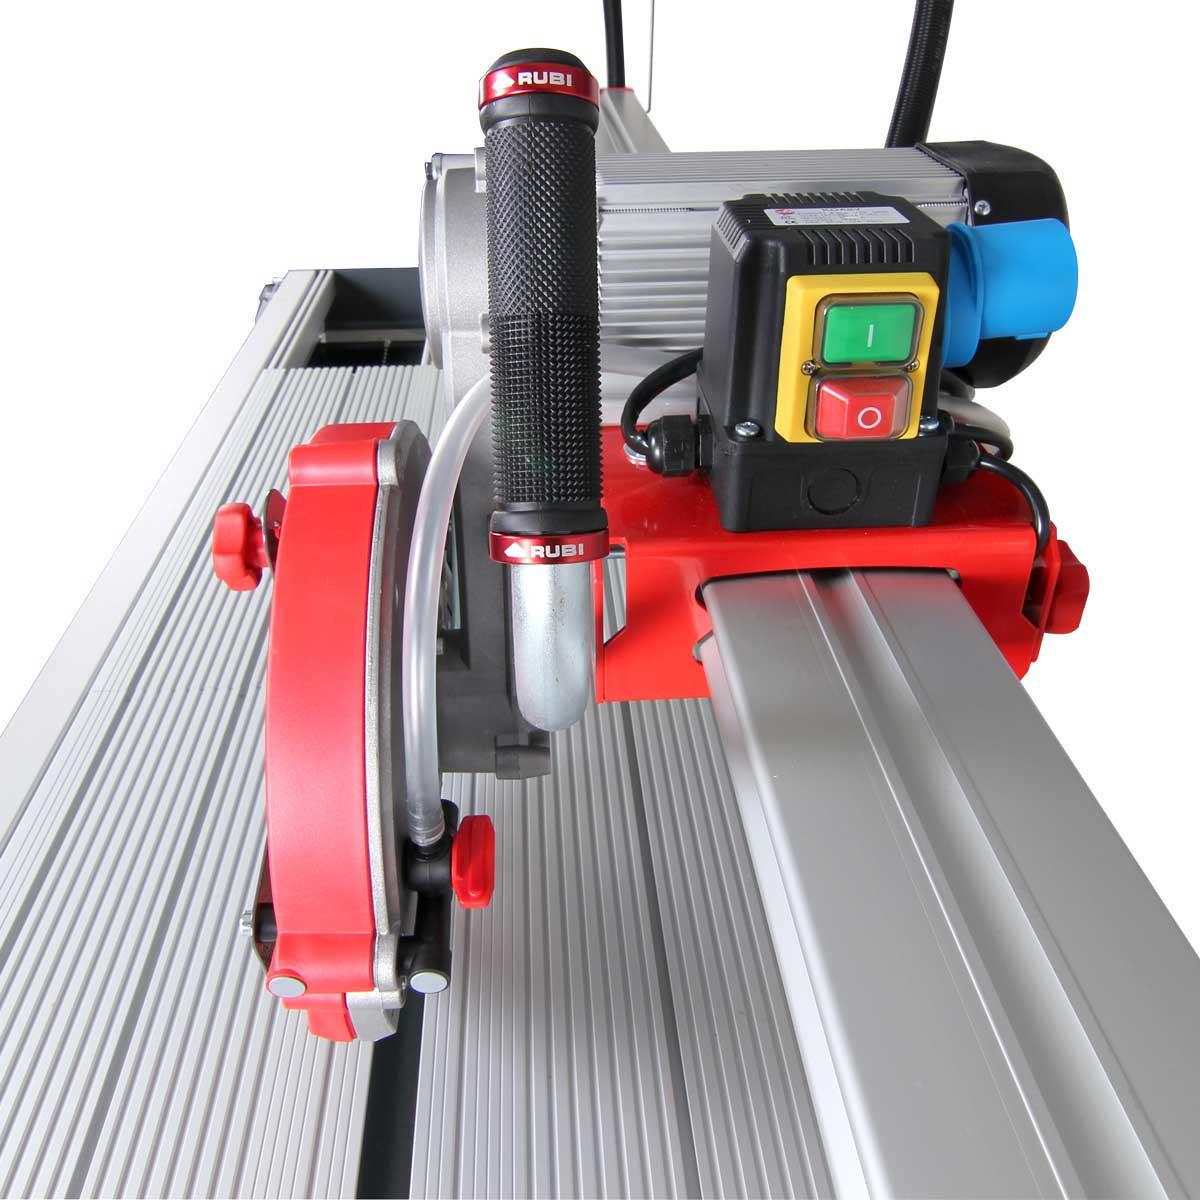 Rubi DX250-1400 Rail saw cutting head and handle